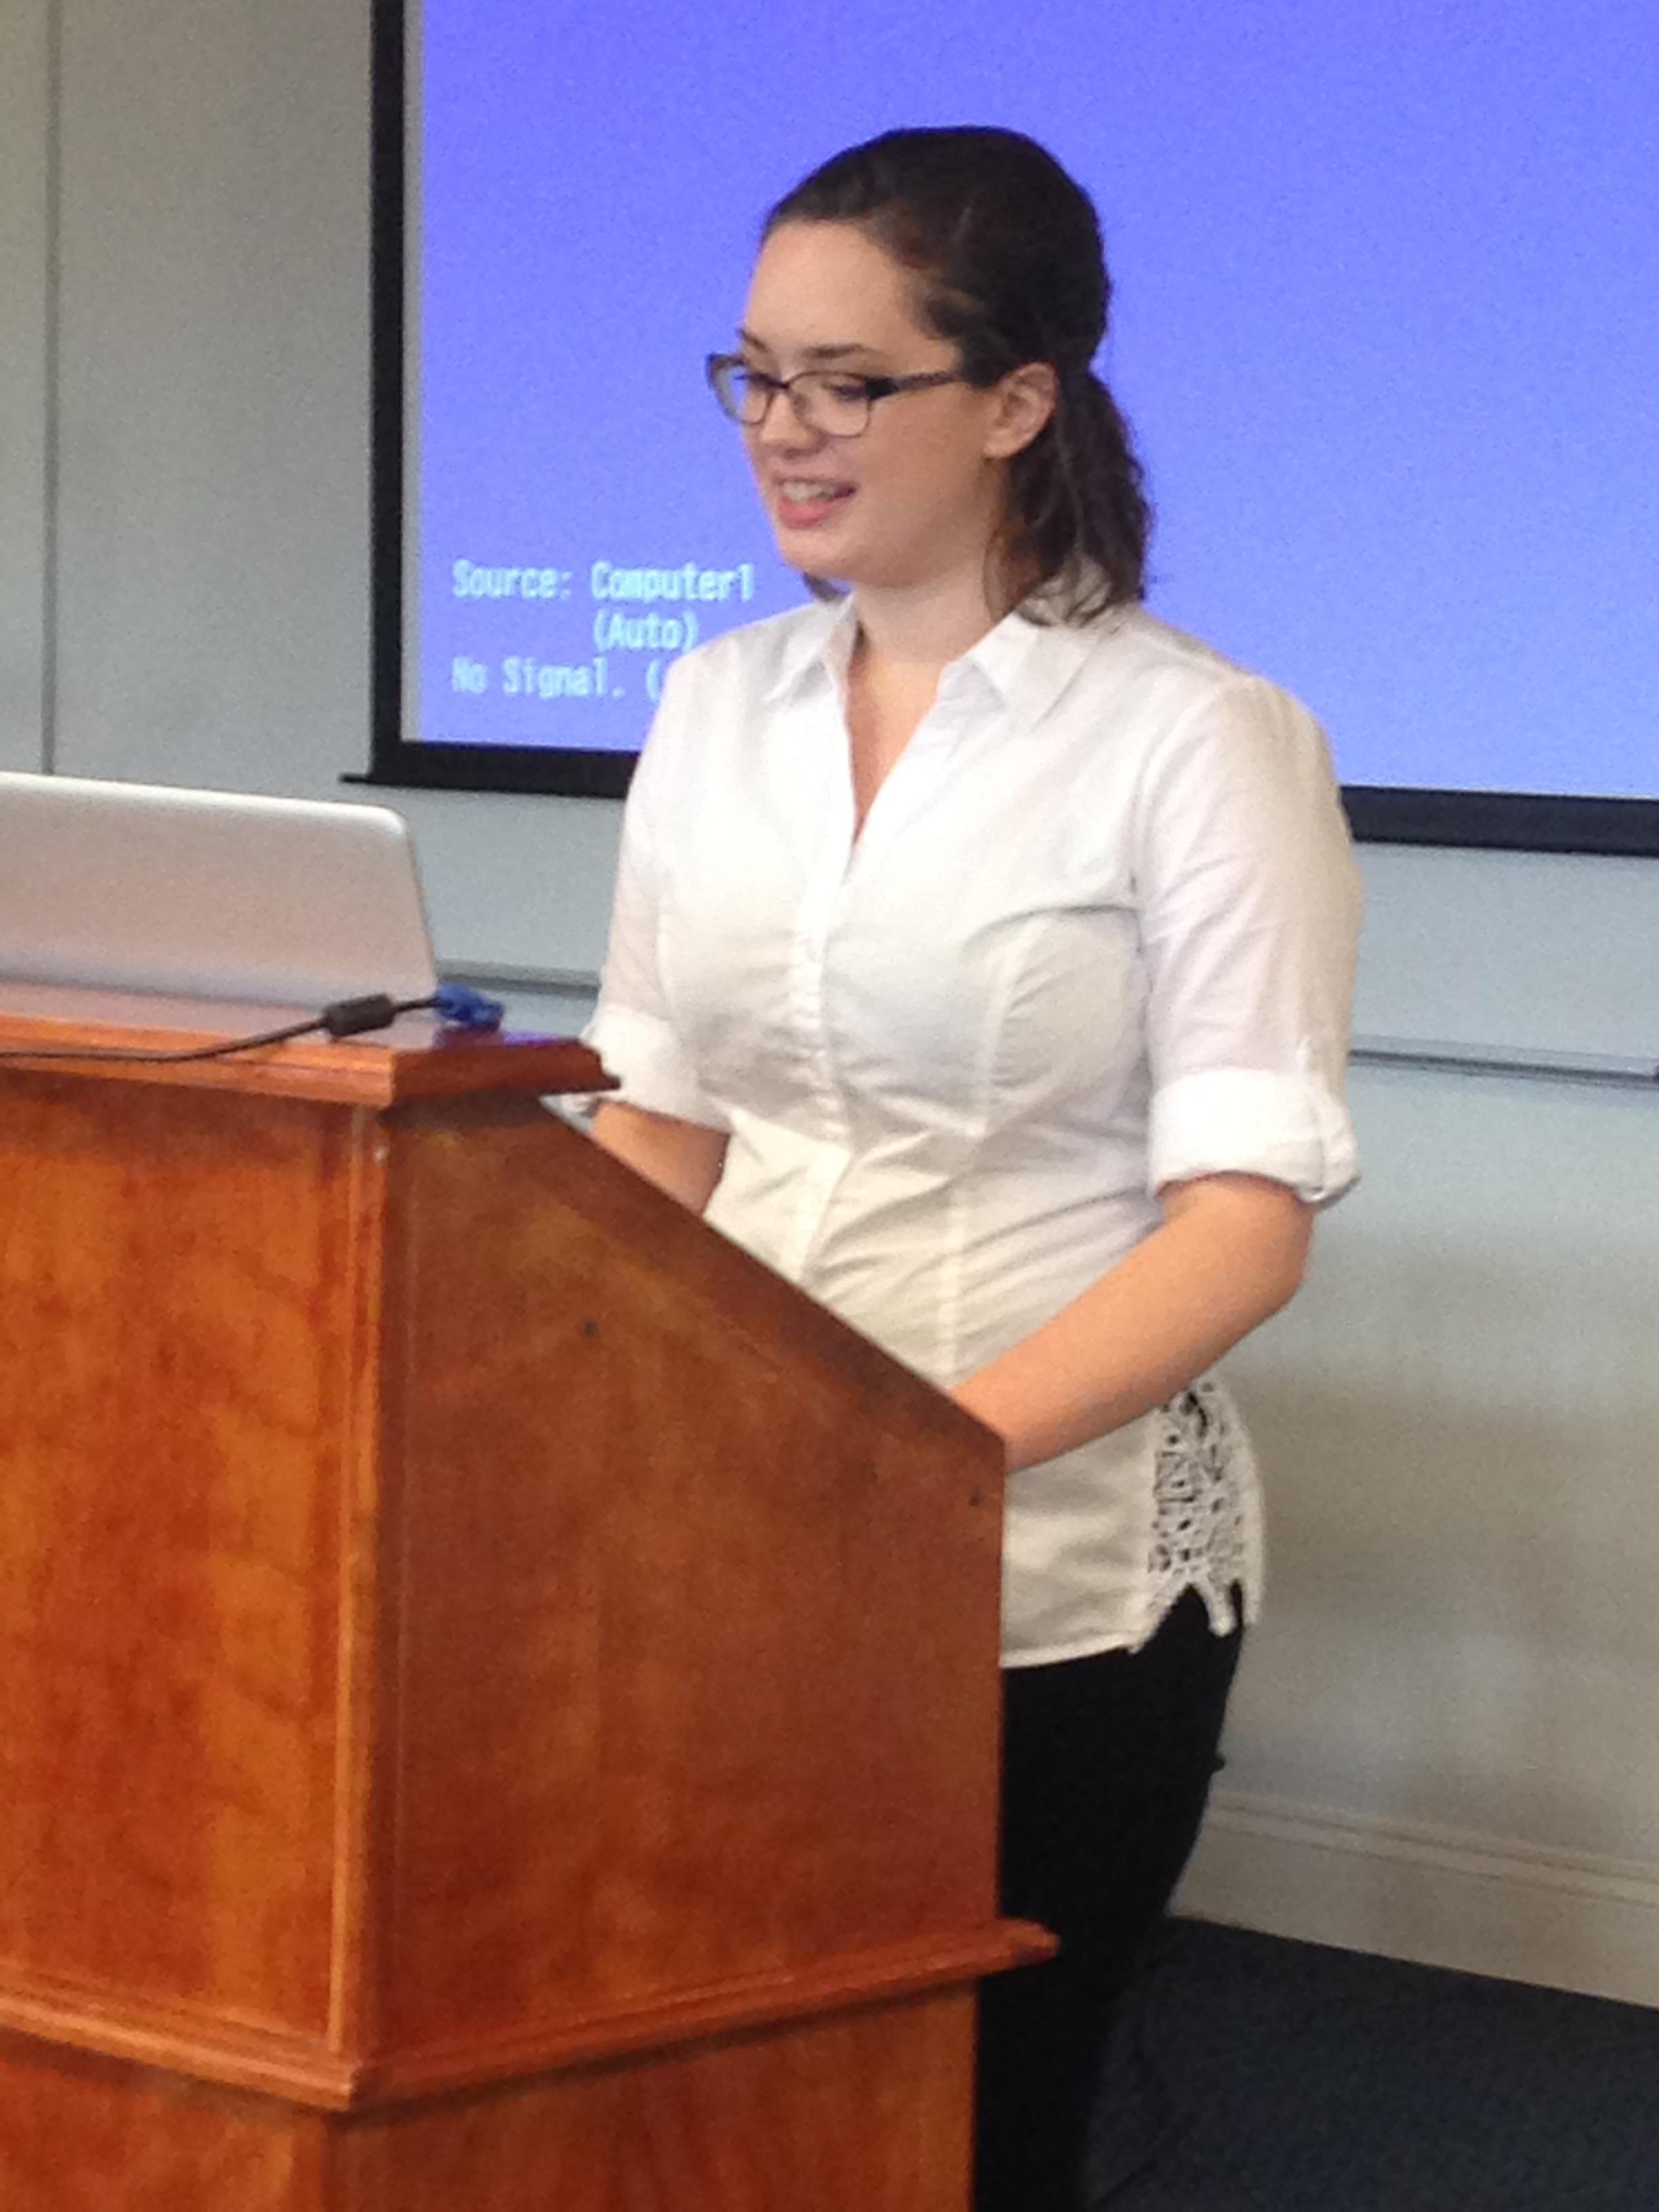 Lillianne_Cobb_GLS_presentation.jpg